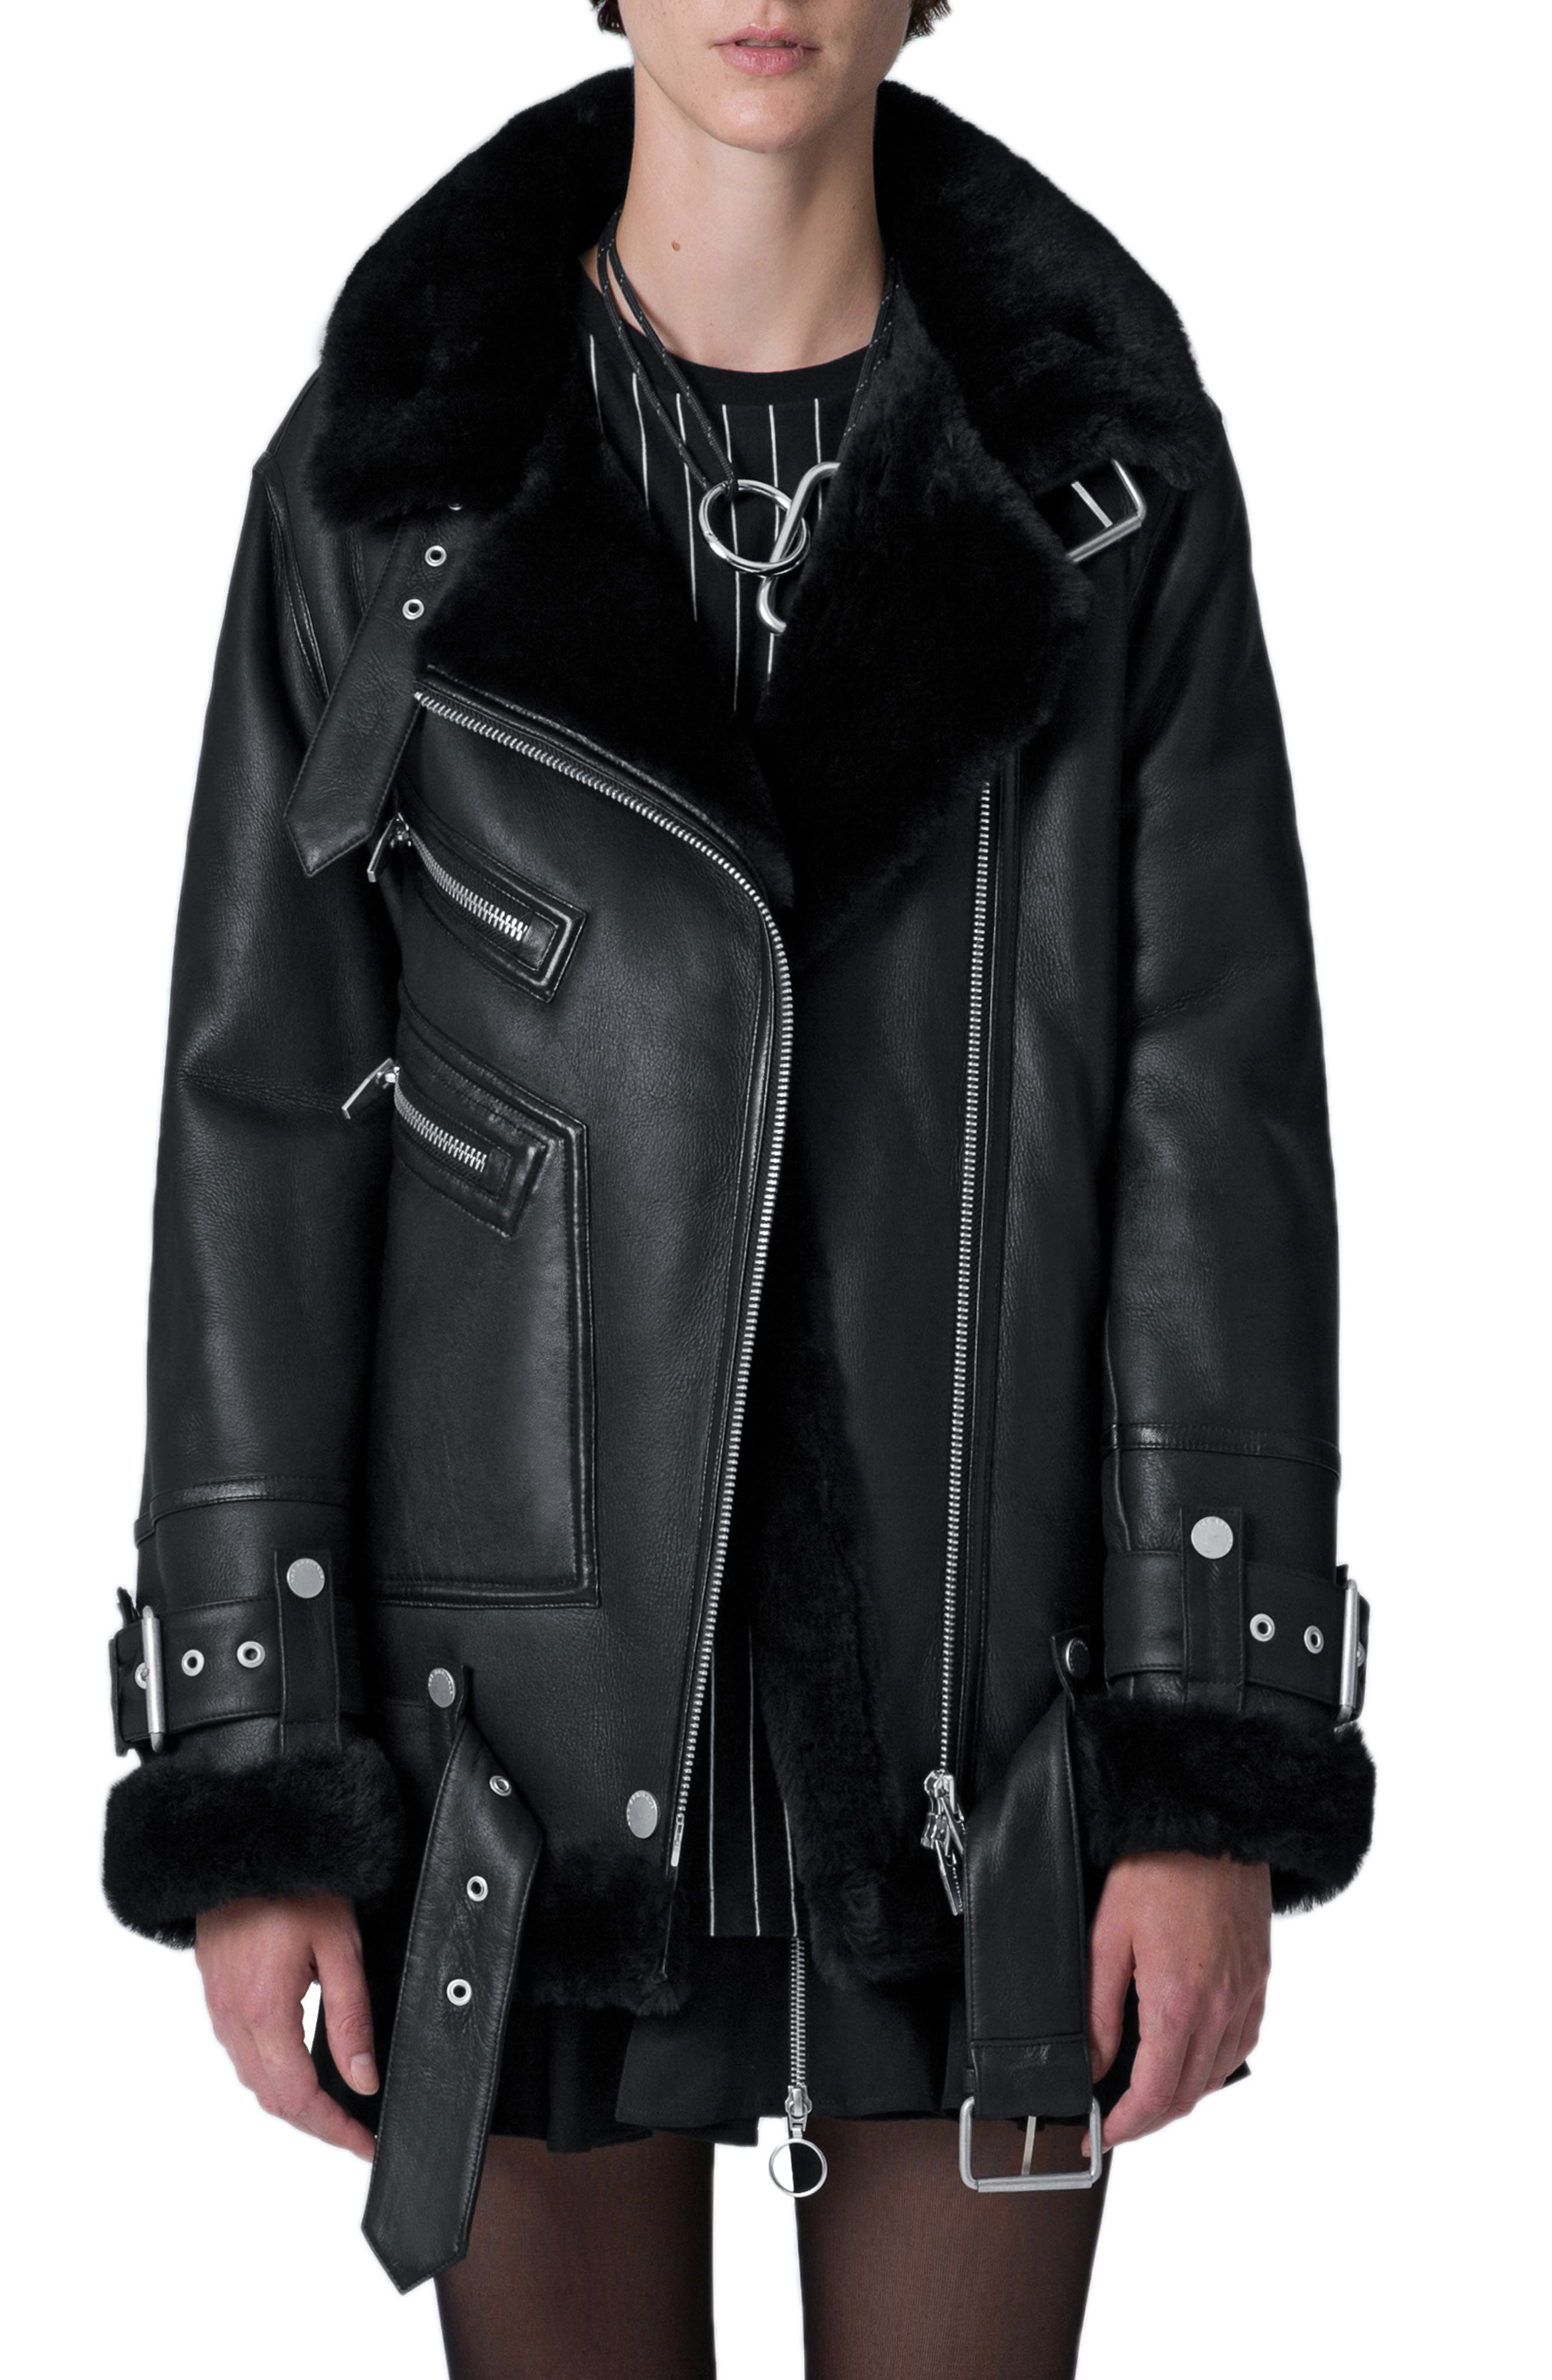 The Arrivals Moya Iii Oversize Leather & Genuine Shearling Jacket, Black